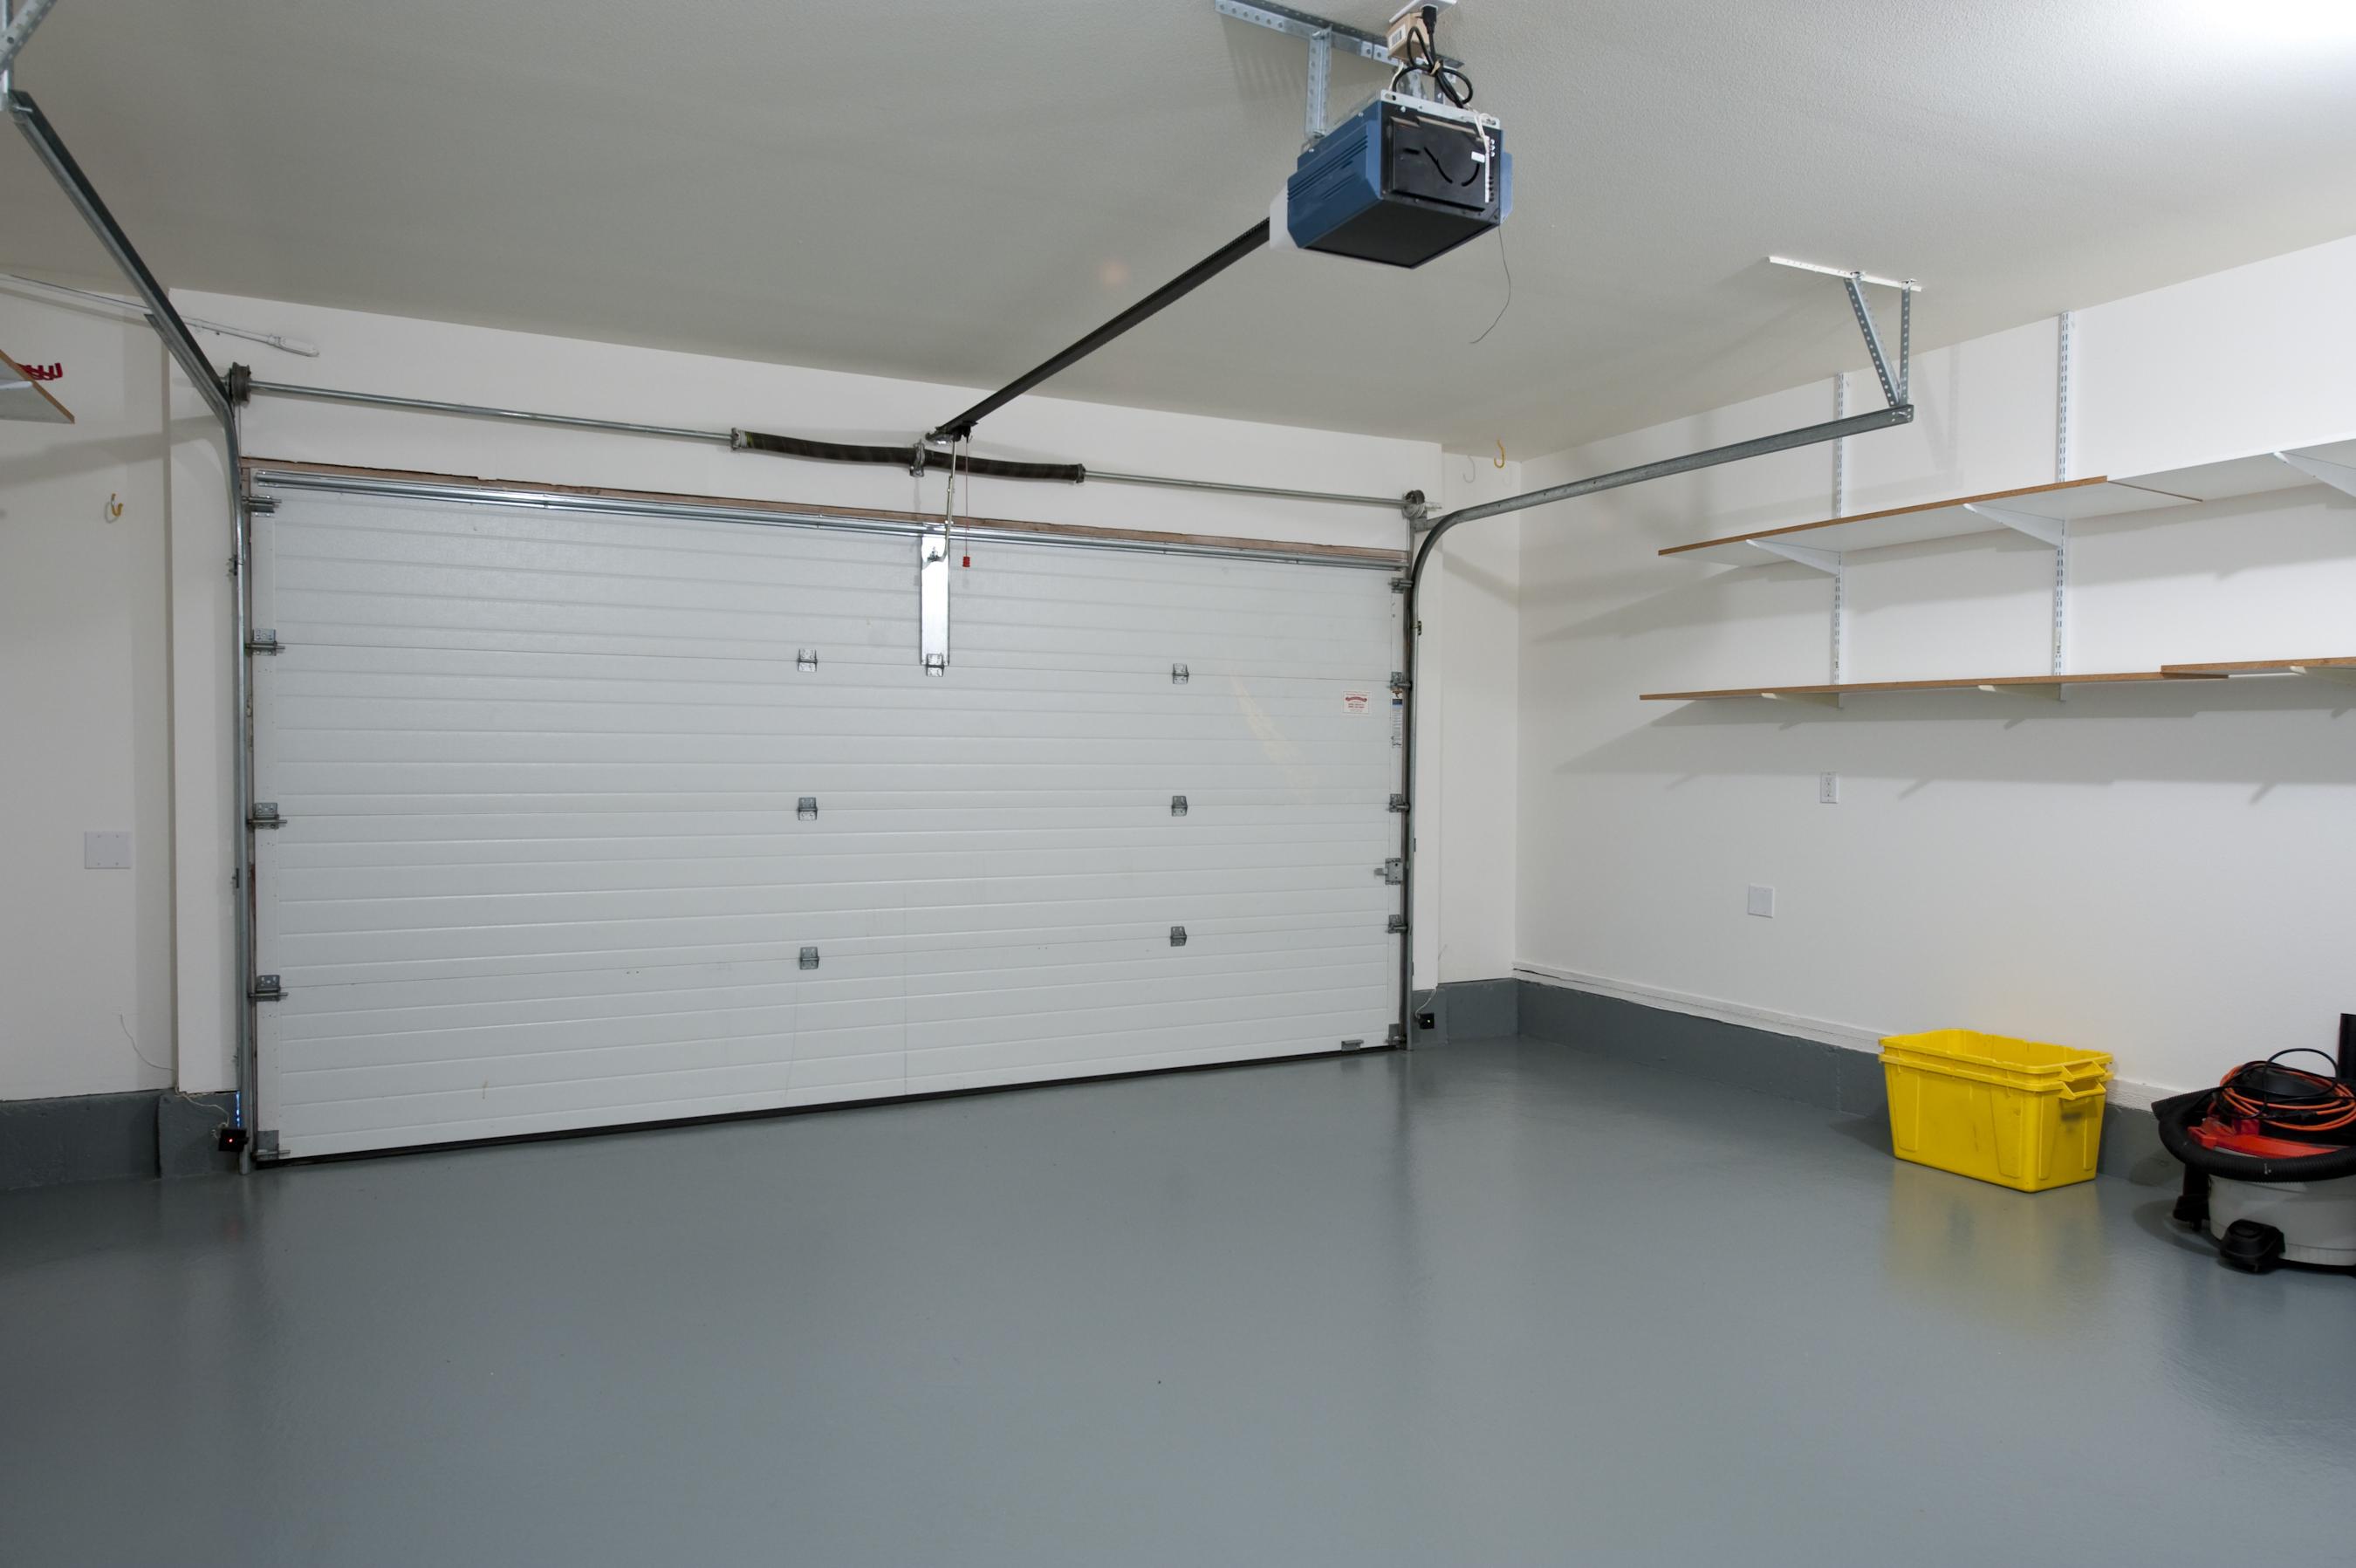 medium resolution of identifying bugs in the garage